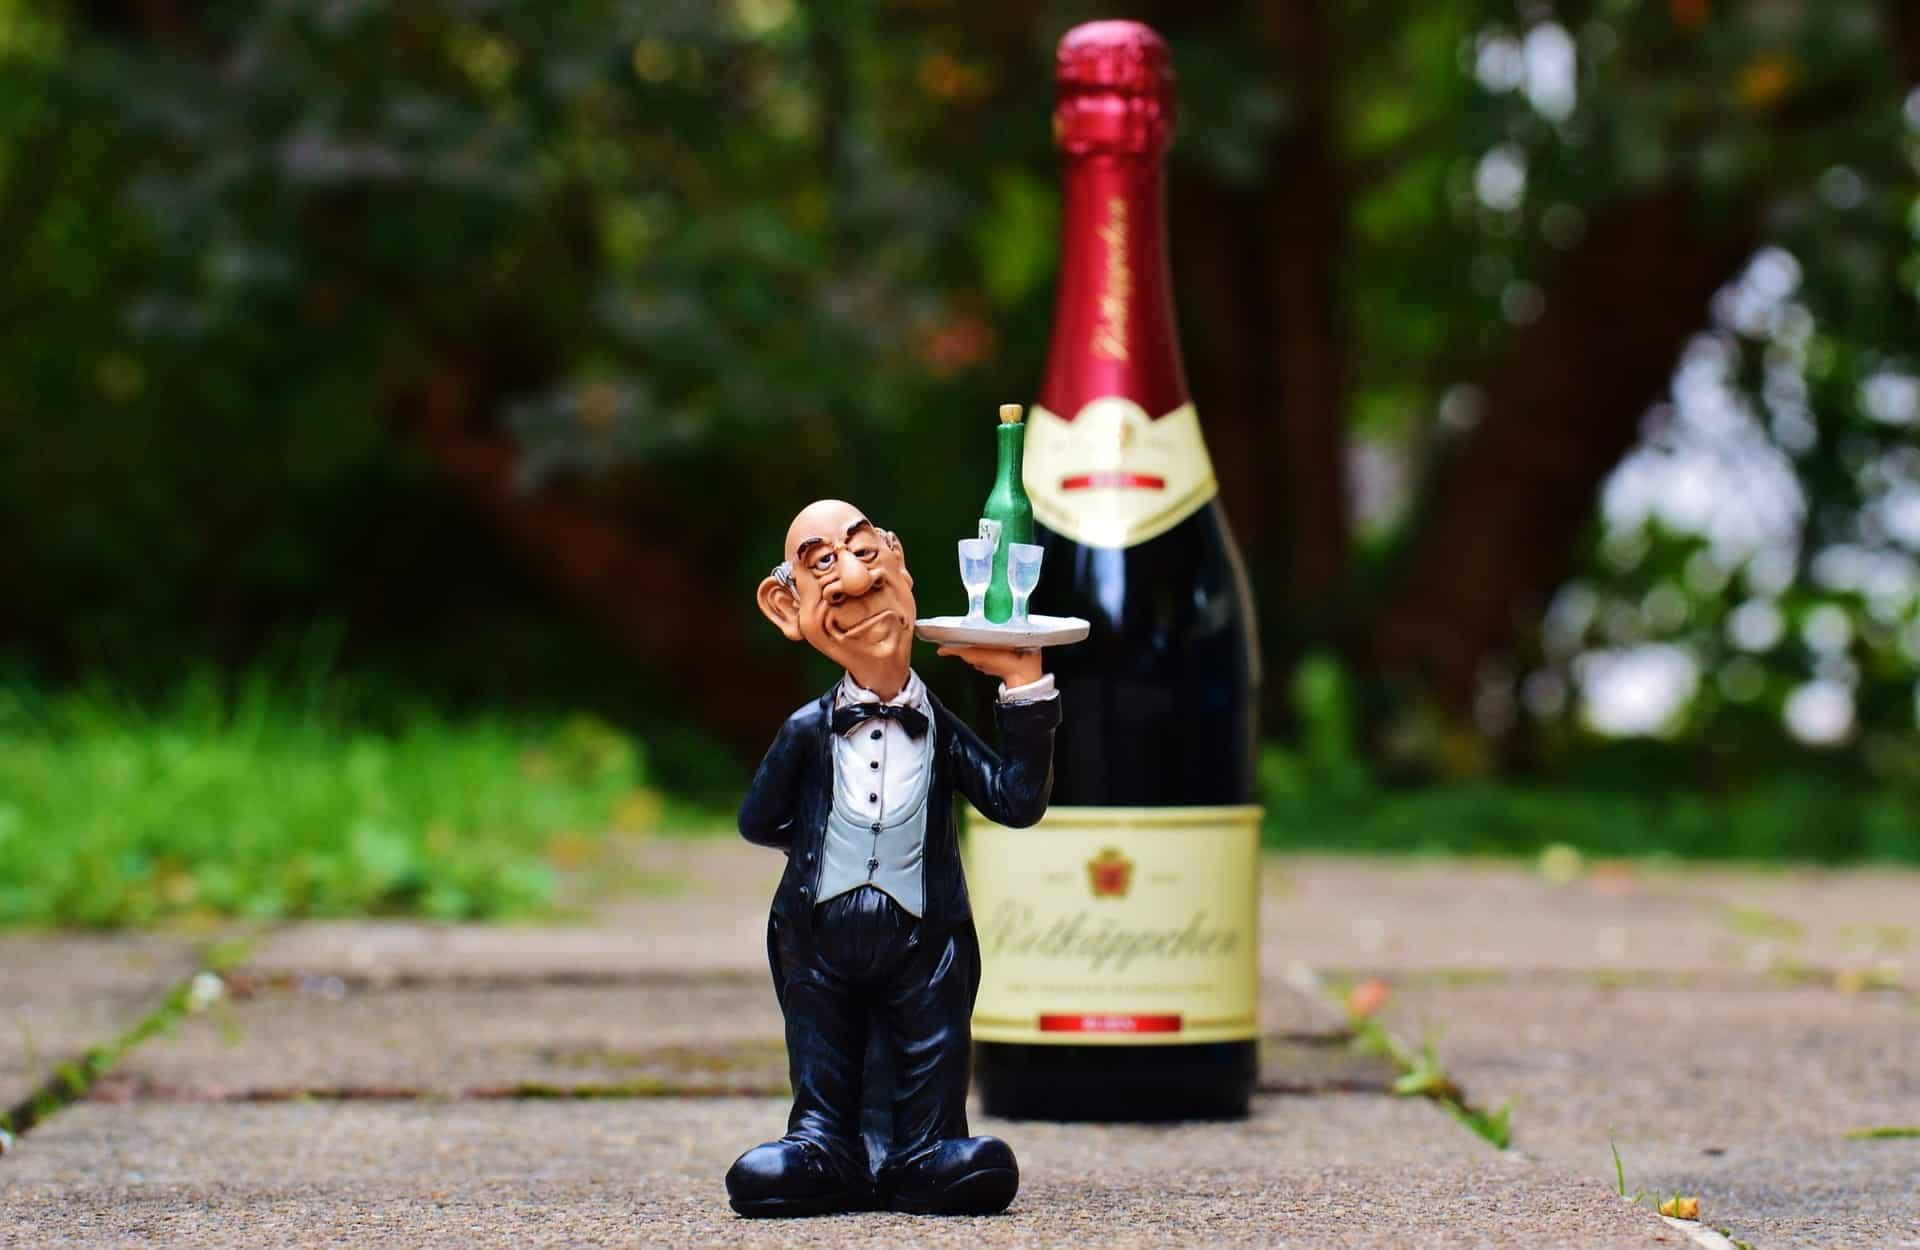 866ce395b224d87ca8641626c1a9d6a5 - Señales que indican que en algunos restaurantes no se debe pedir vino